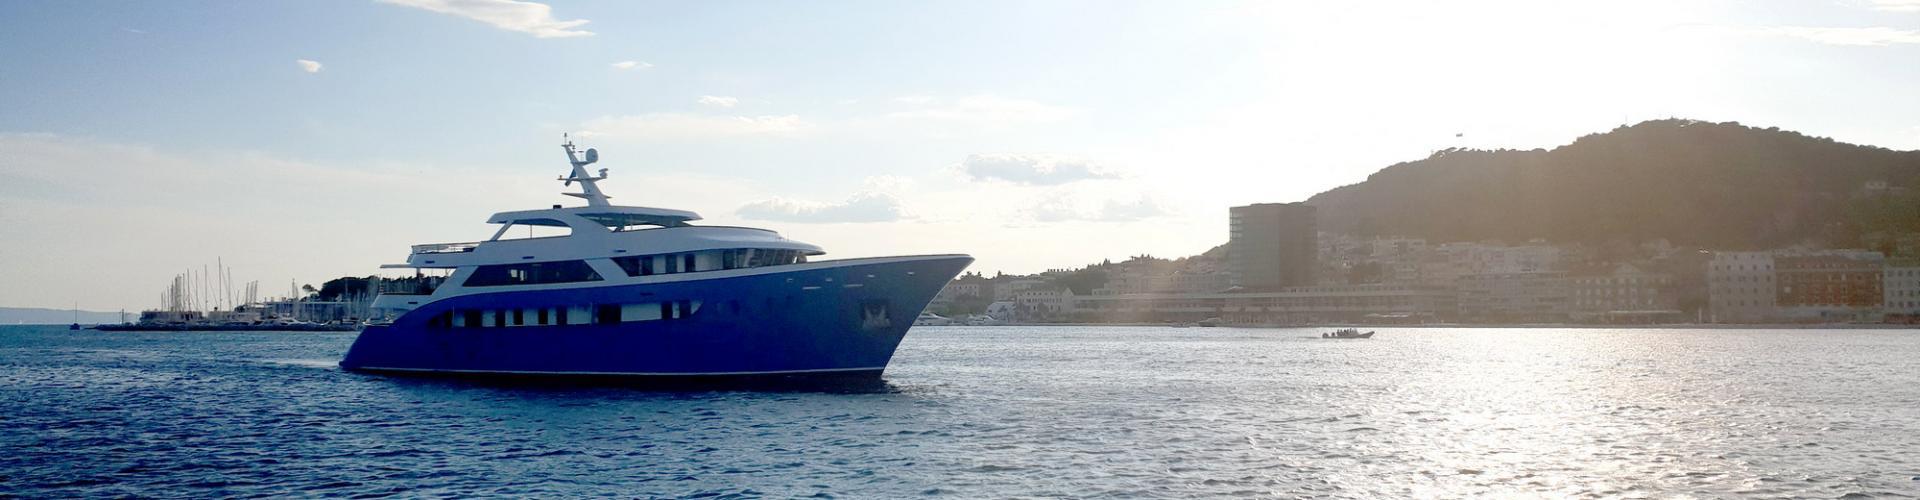 2018. Deluxe cruiser MV San Antonio